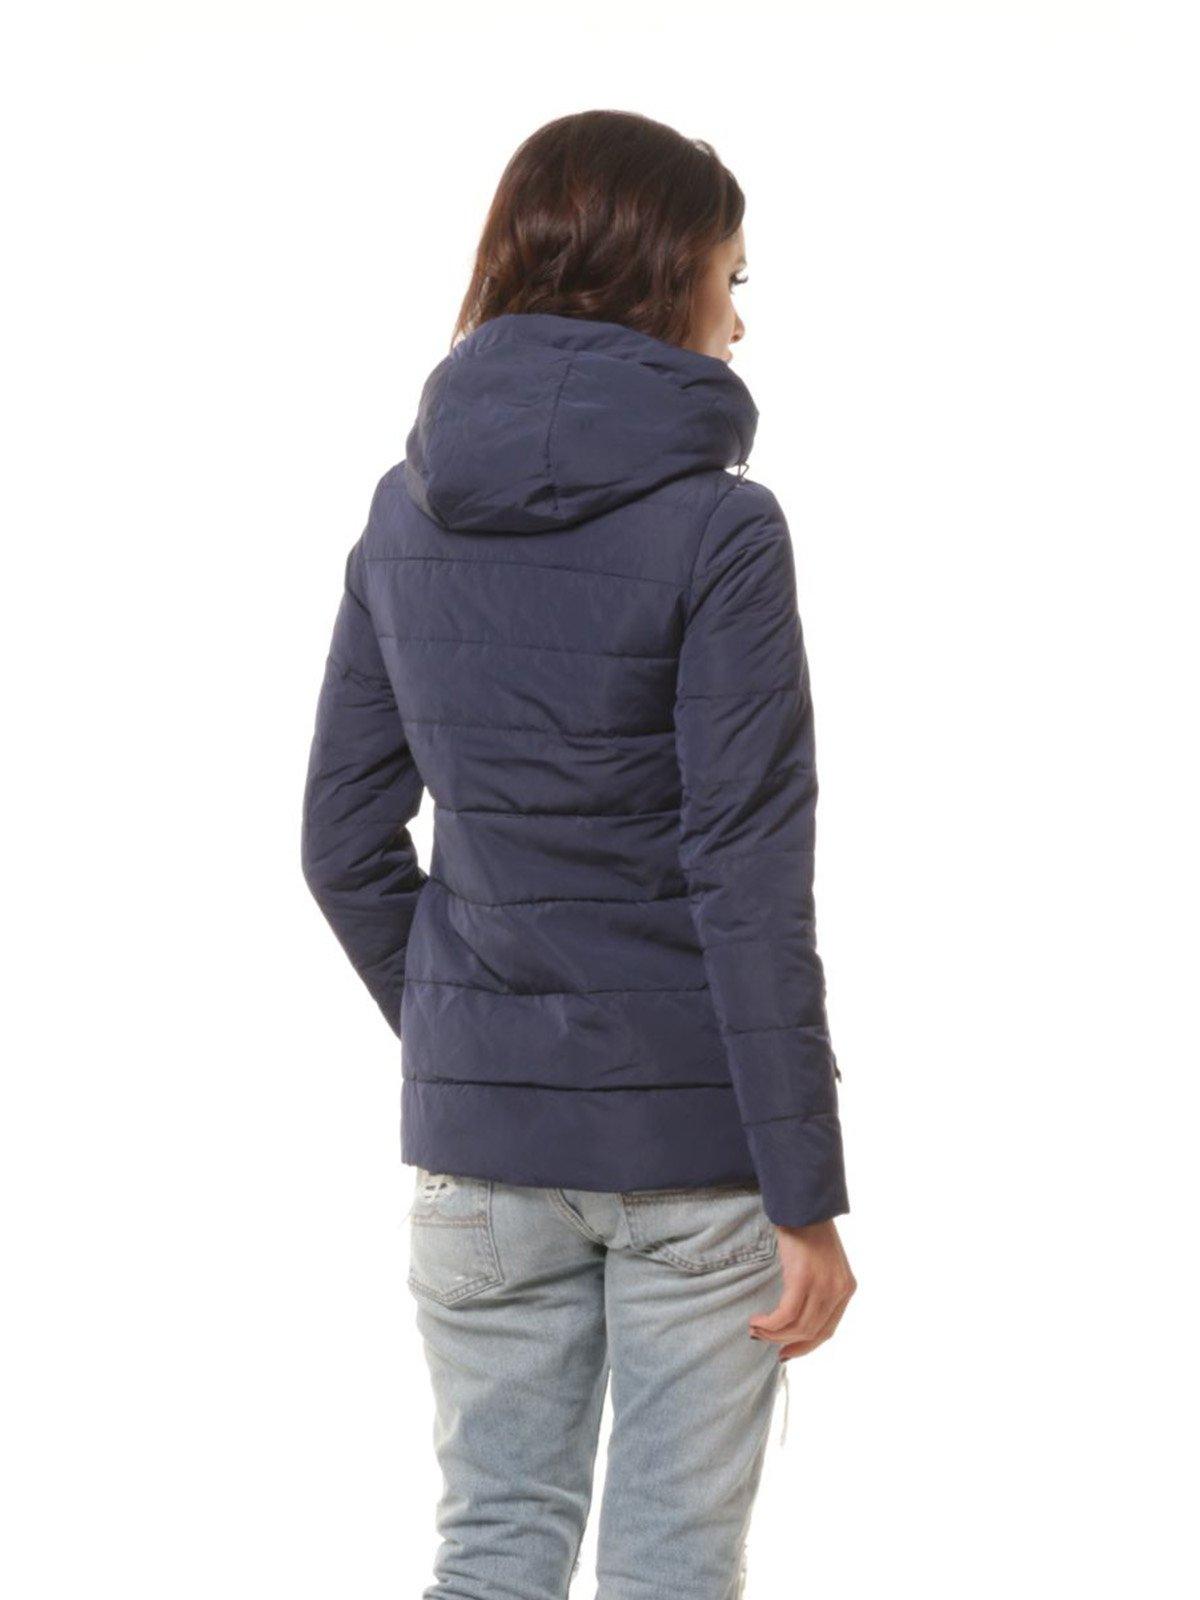 Куртка темно-синяя | 2971397 | фото 3